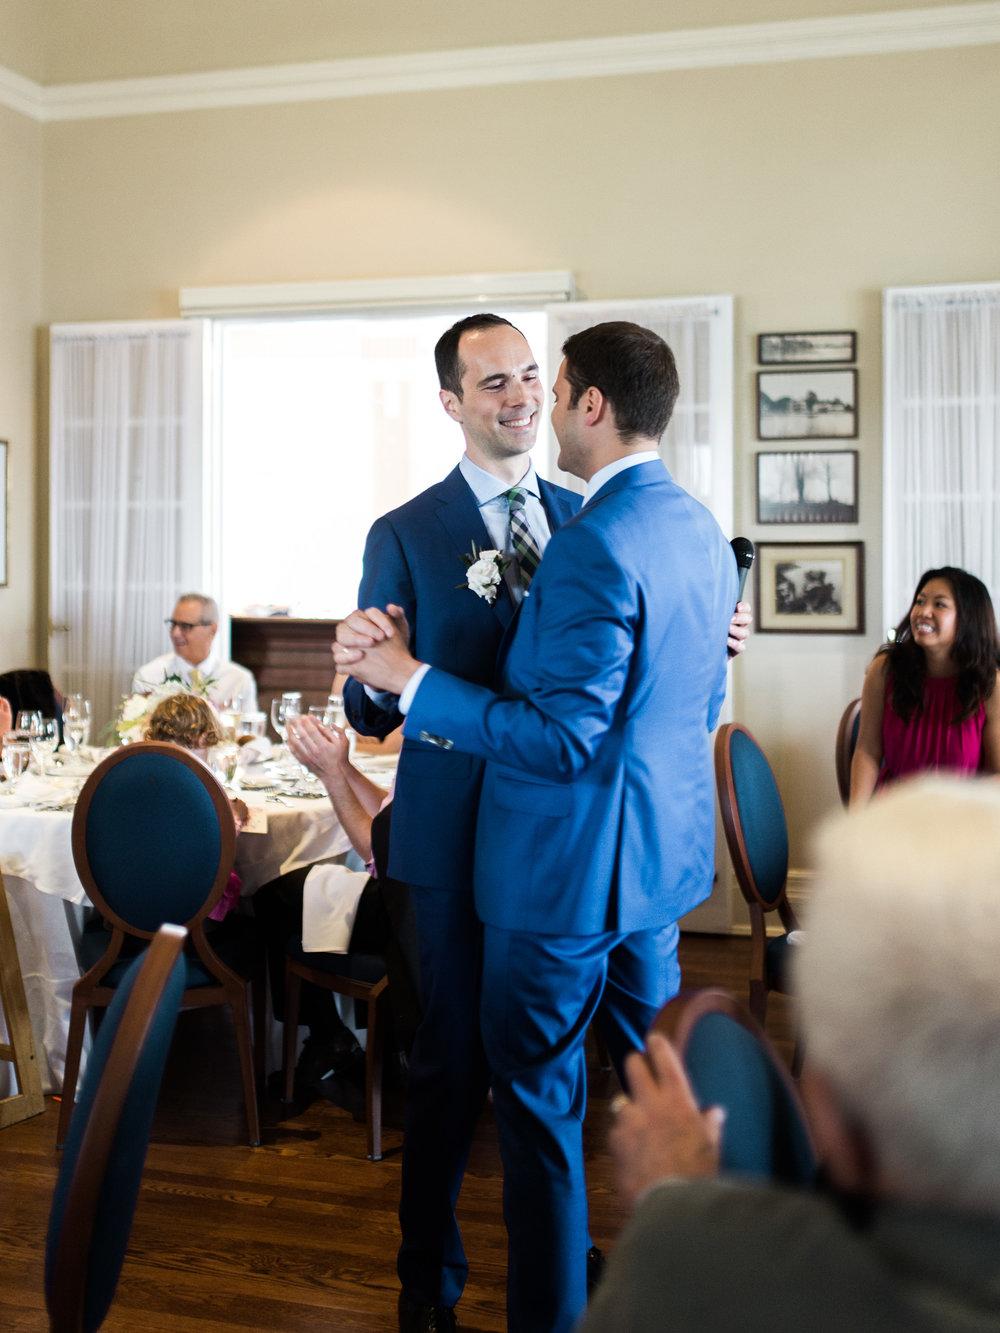 toronto-island-Royal-canadian-yacht-club-wedding-photographer-49